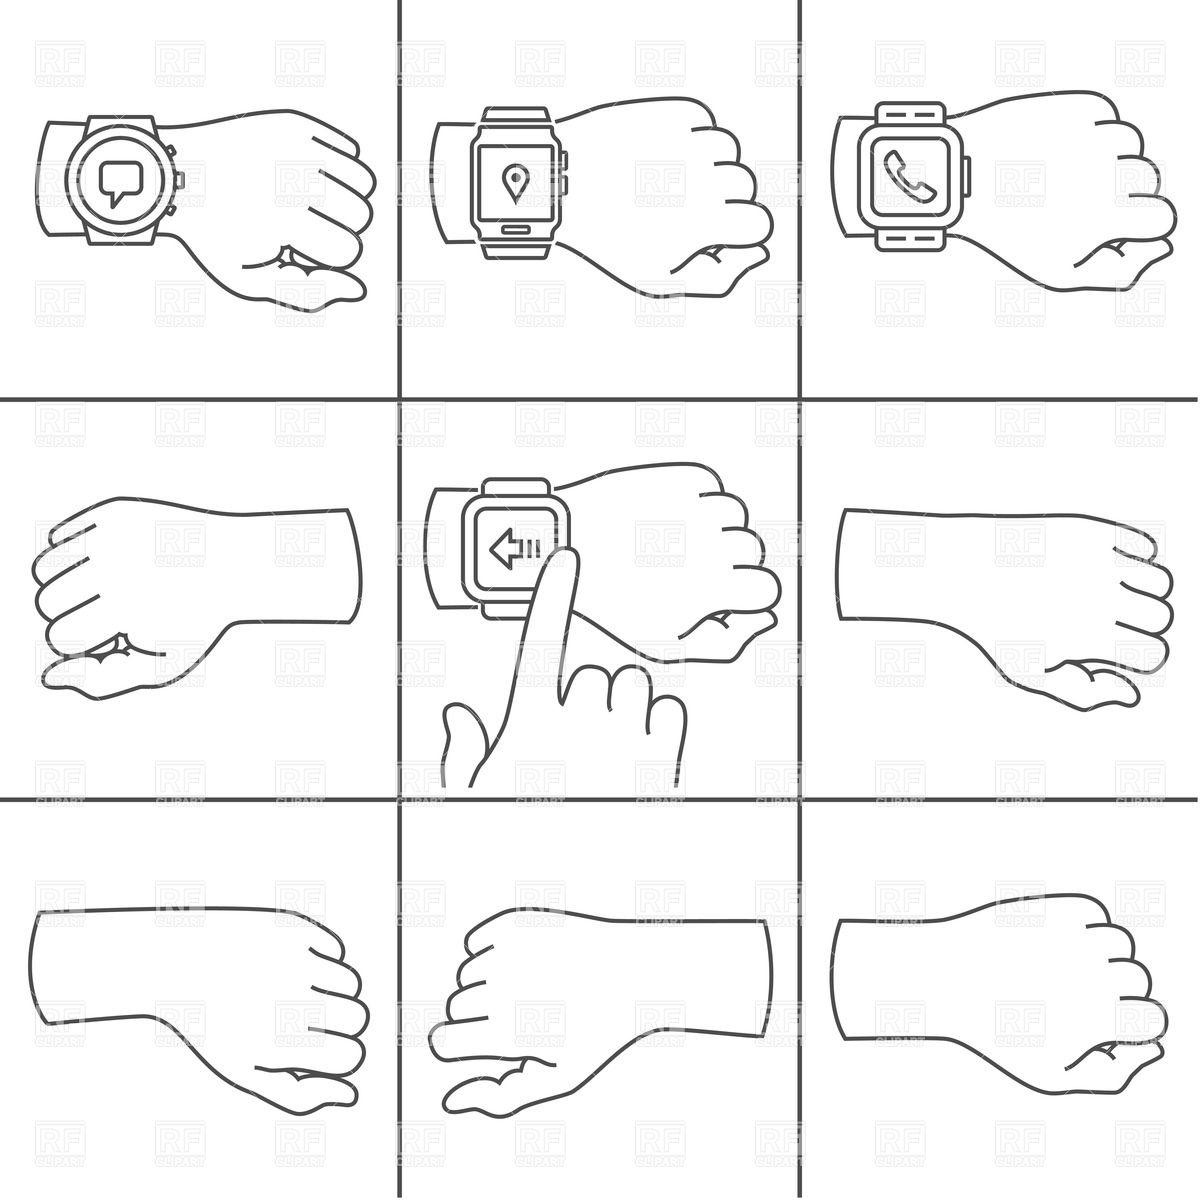 Sketched hands with smartwatch Vector Image #36146.